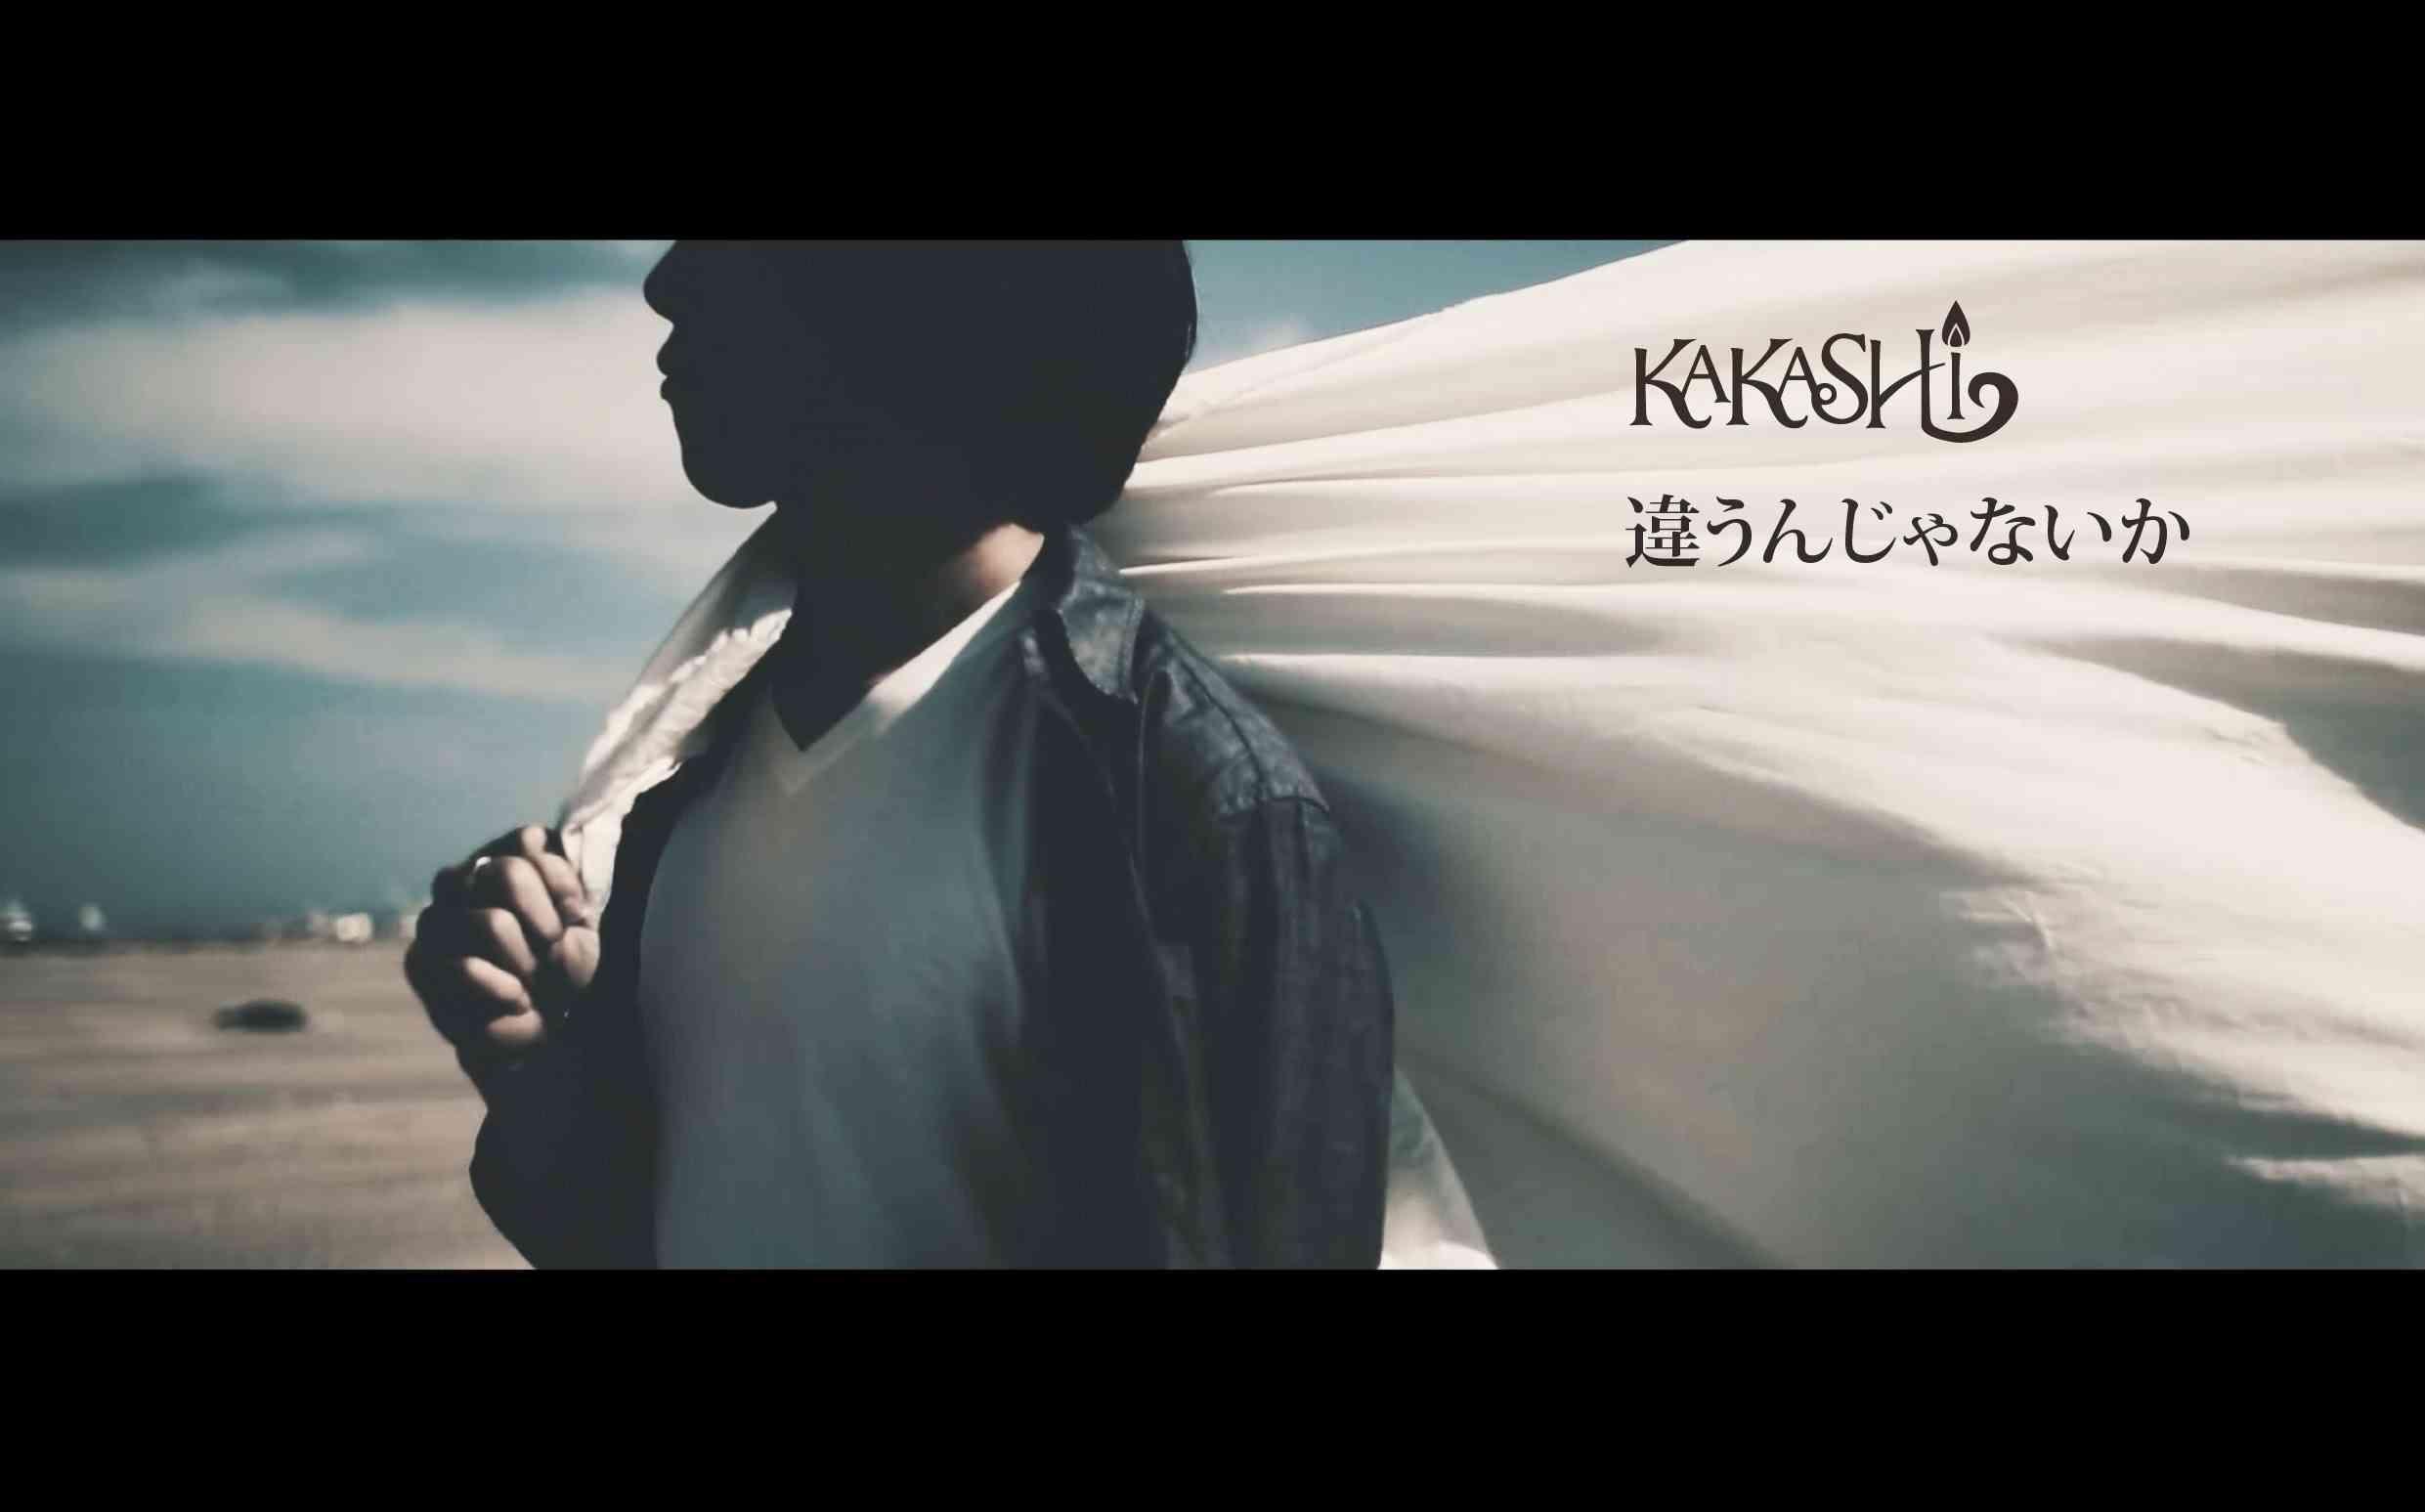 KAKASHI -違うんじゃないか- 【Music Video】 - YouTube